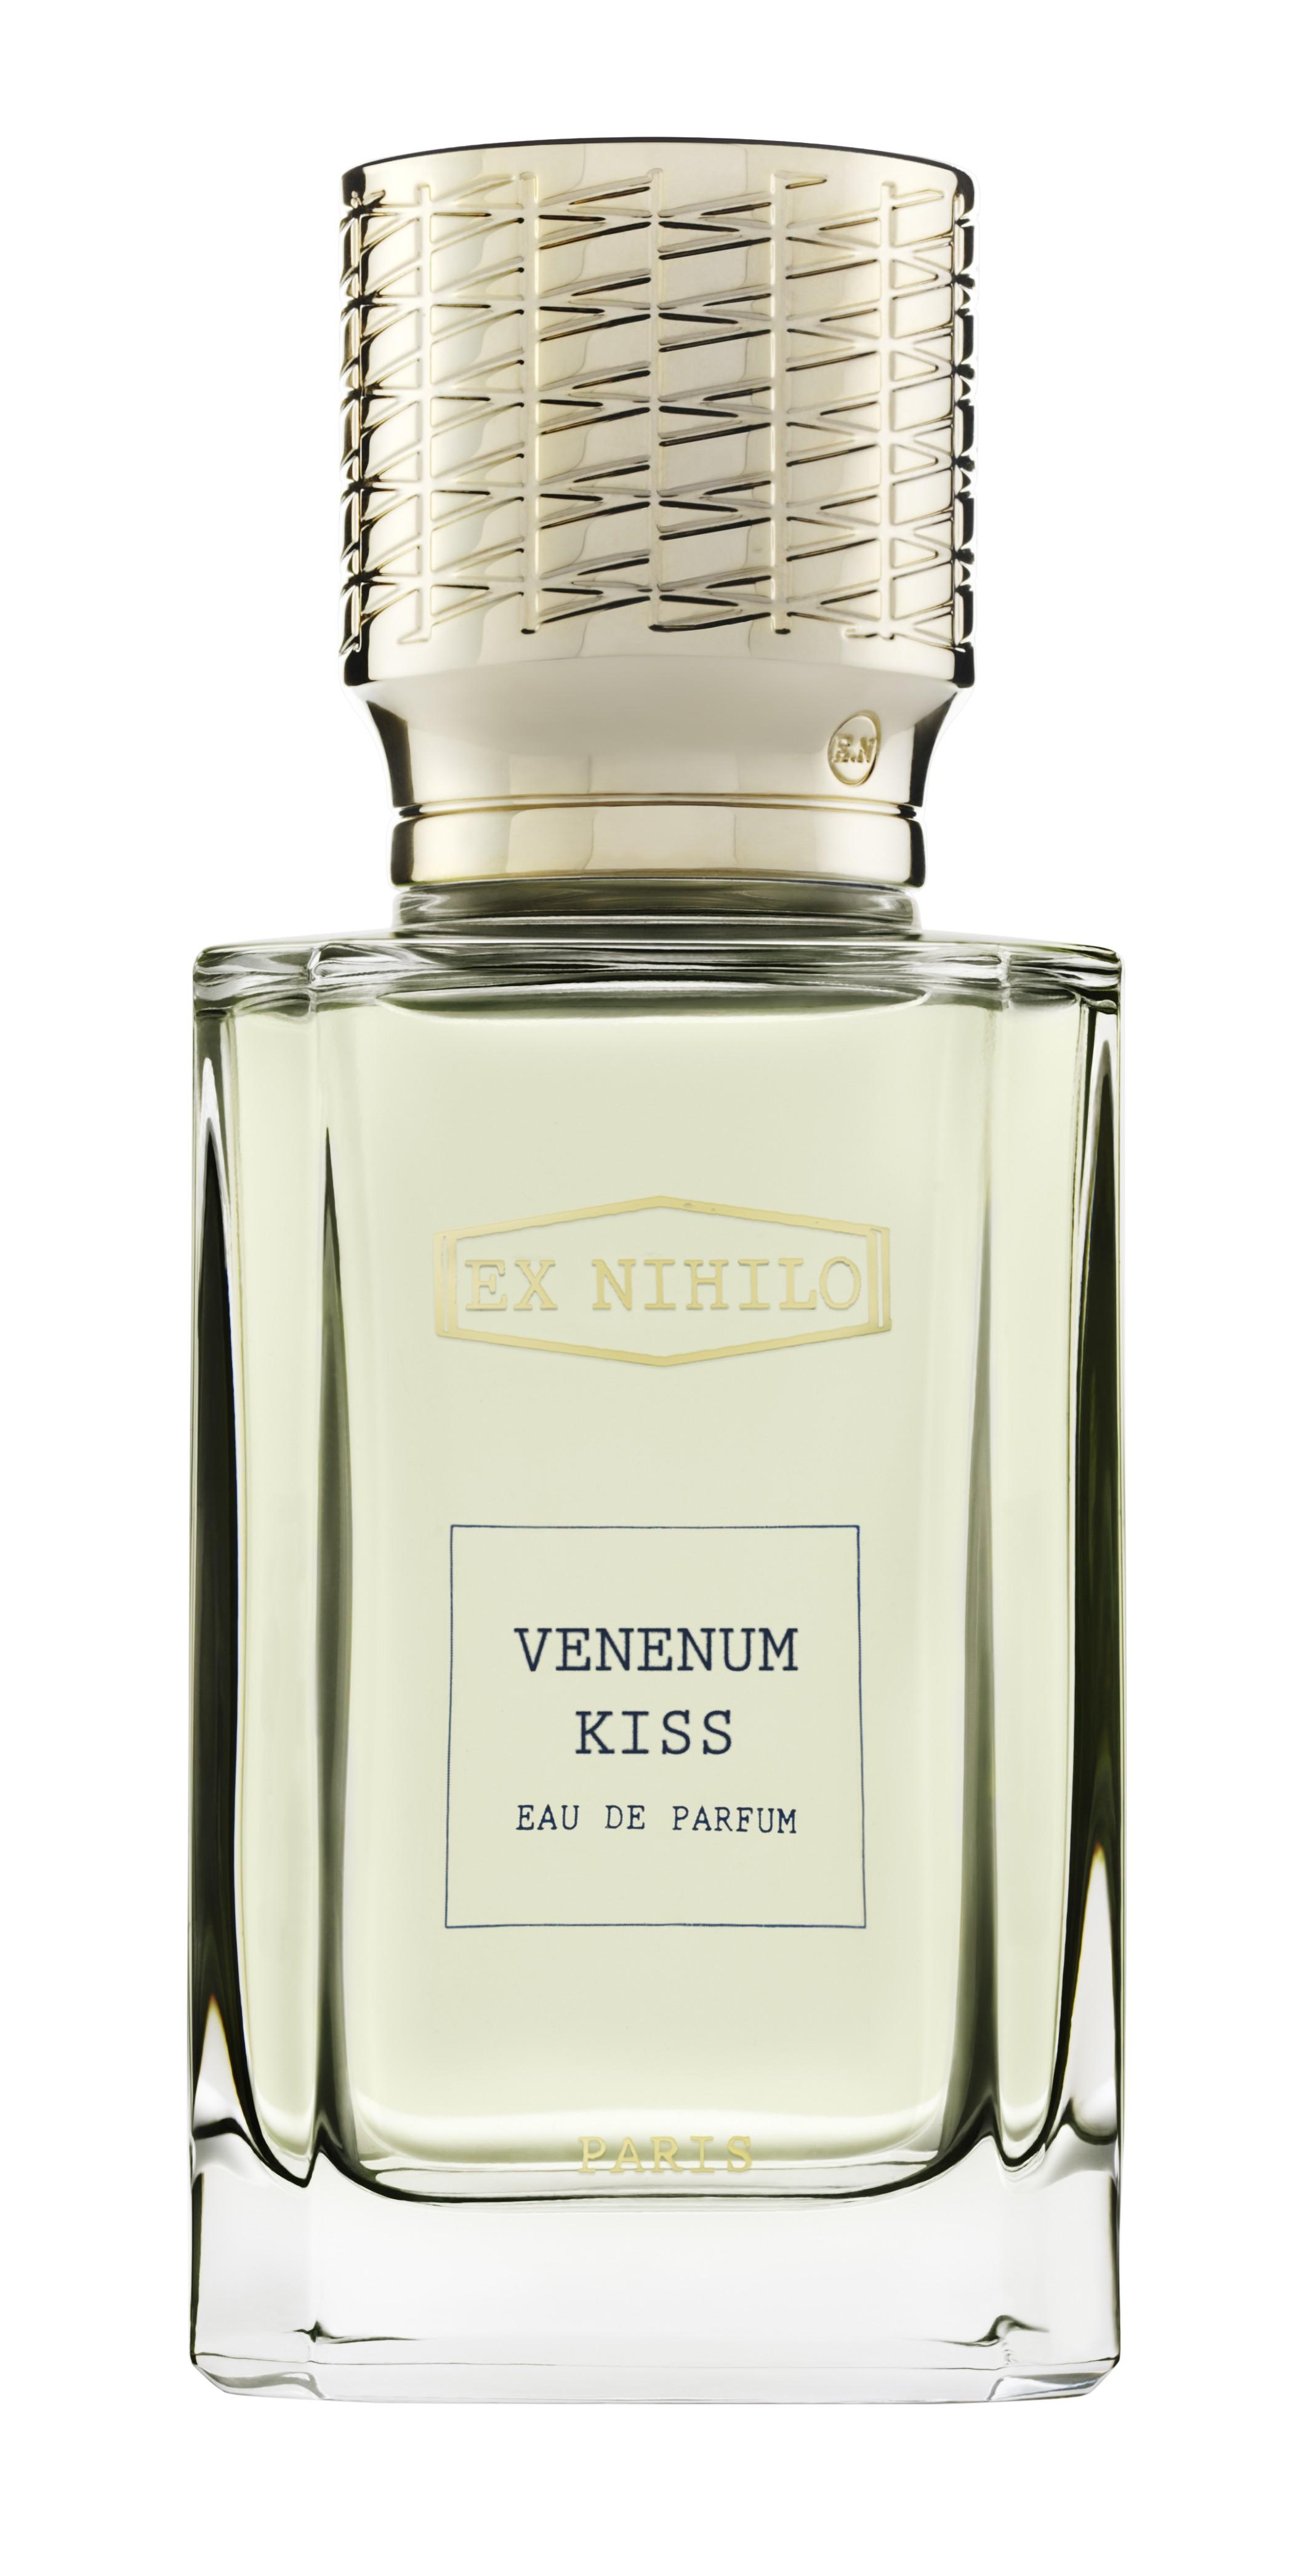 Ex Nihilo Venenum Kiss аромат для мужчин и женщин